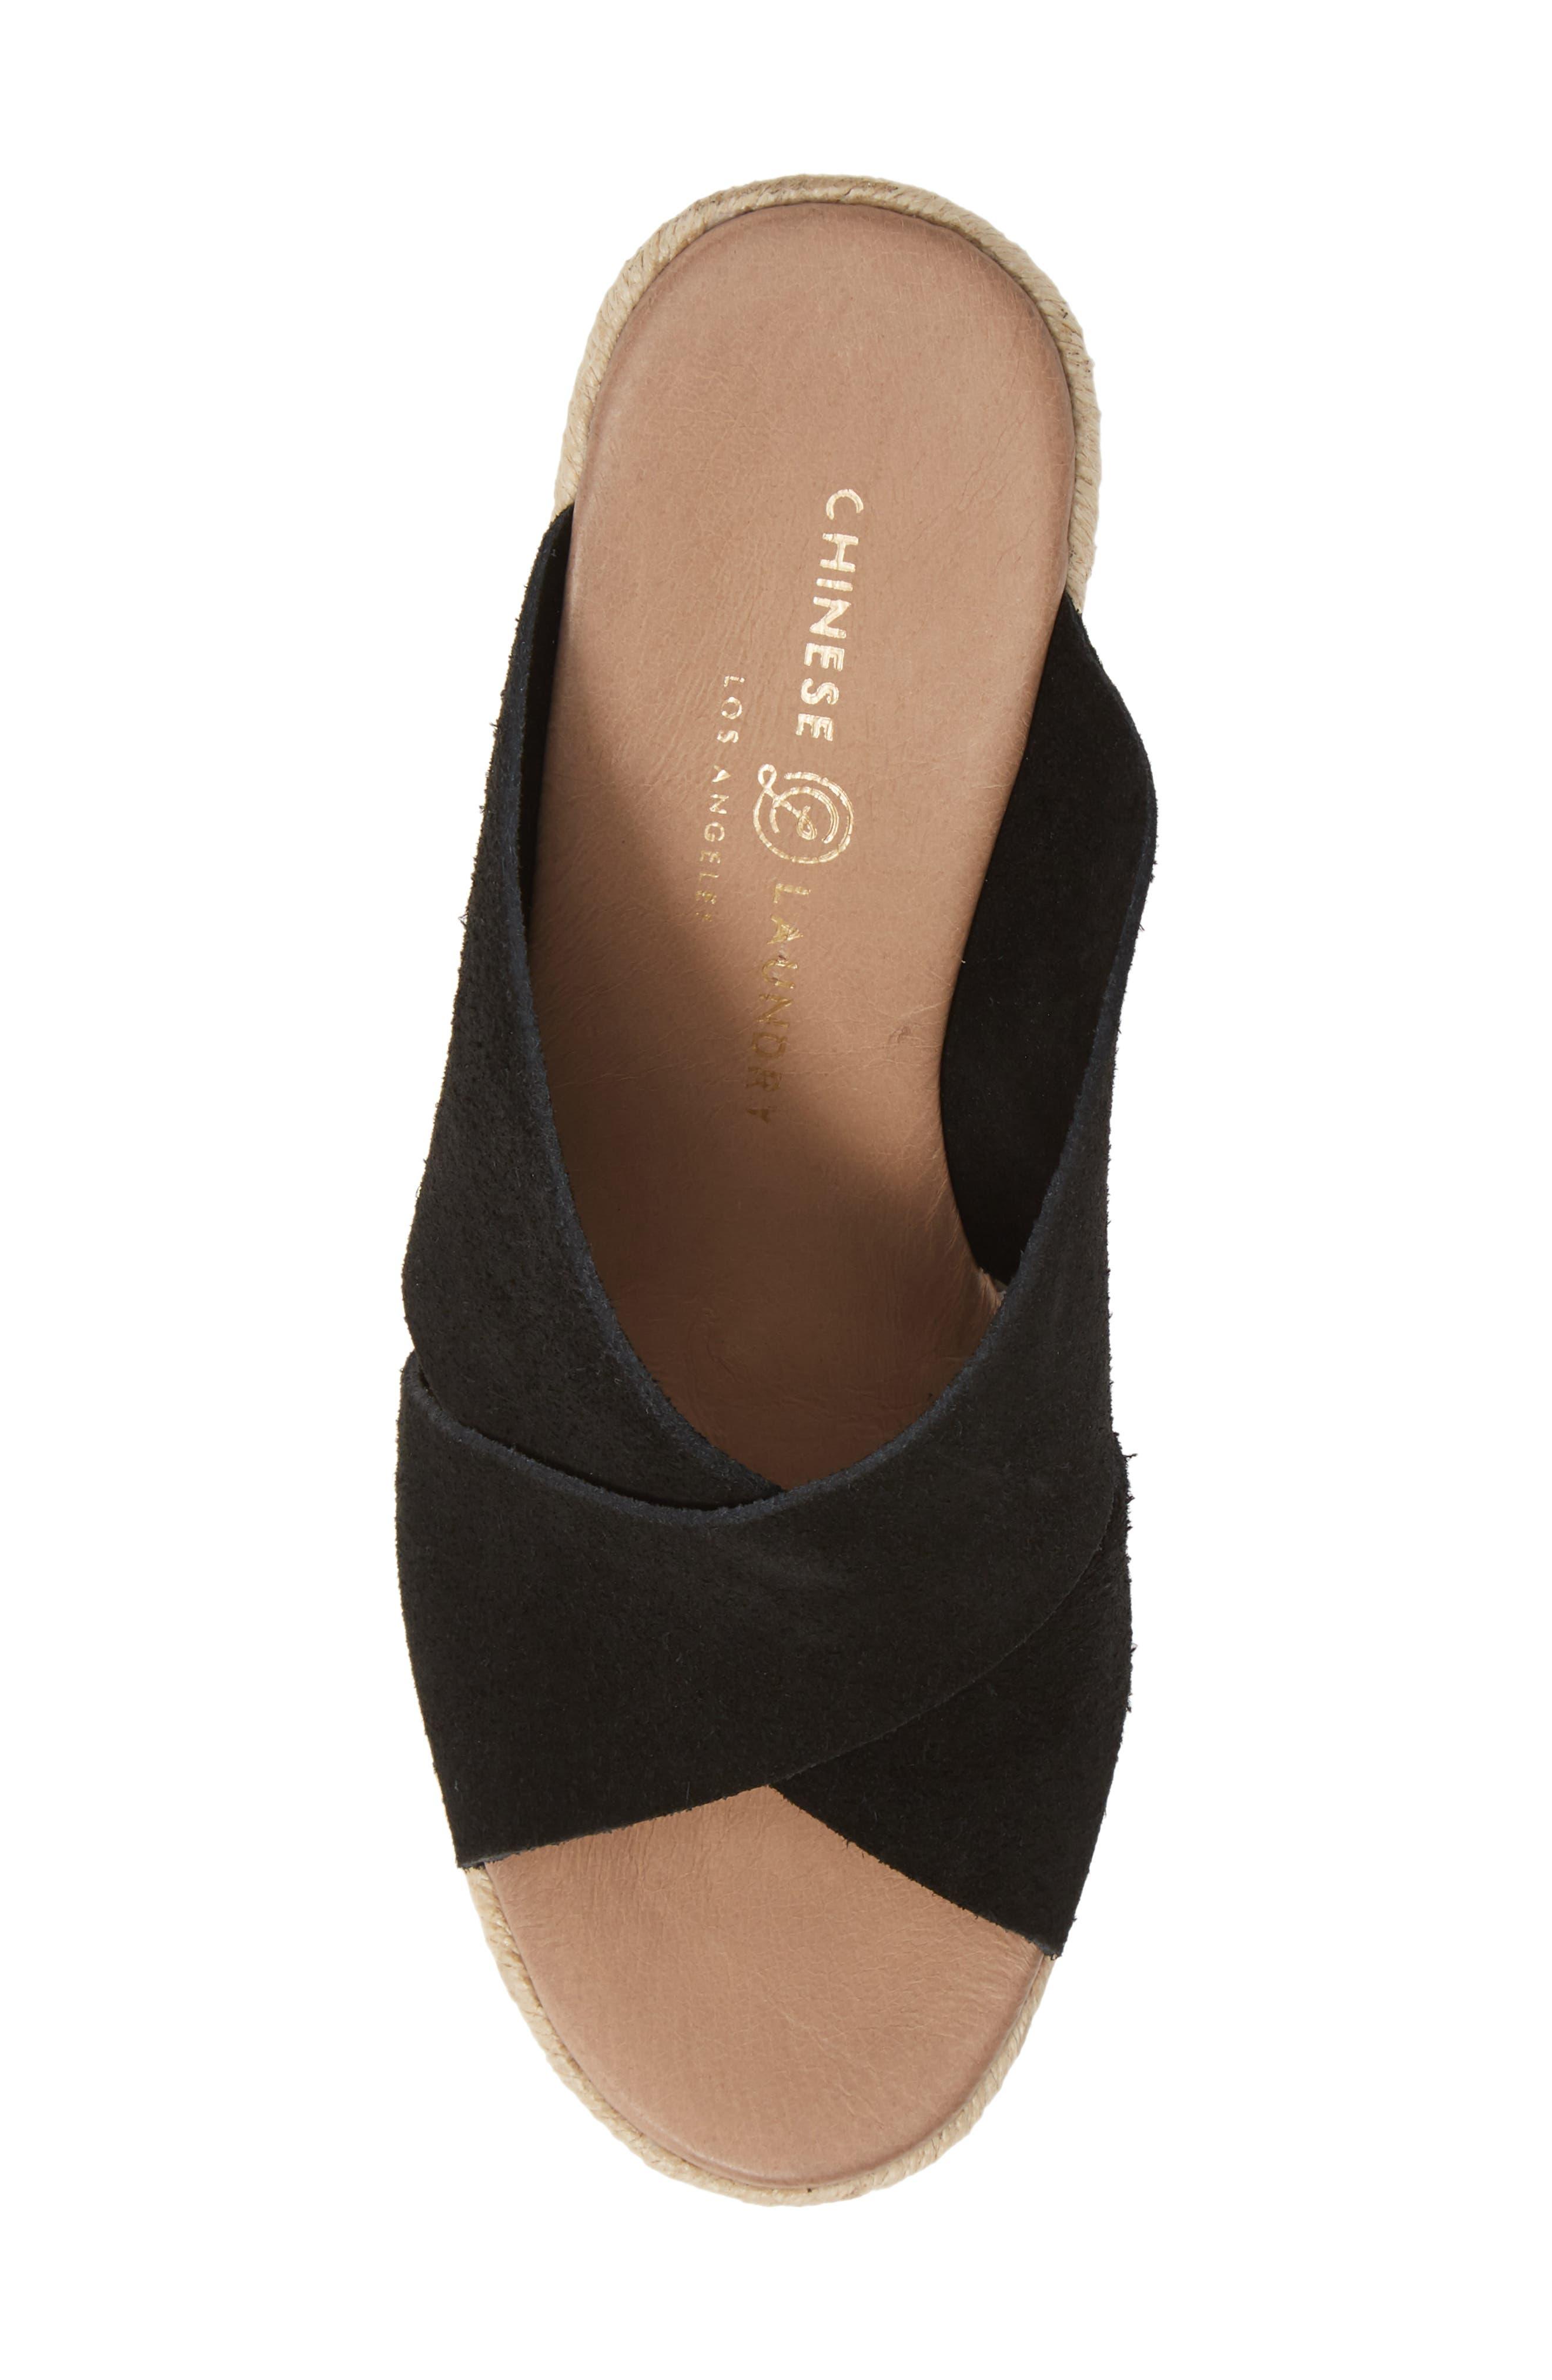 CHINESE LAUNDRY, Quay Platform Sandal, Alternate thumbnail 5, color, BLACK SUEDE